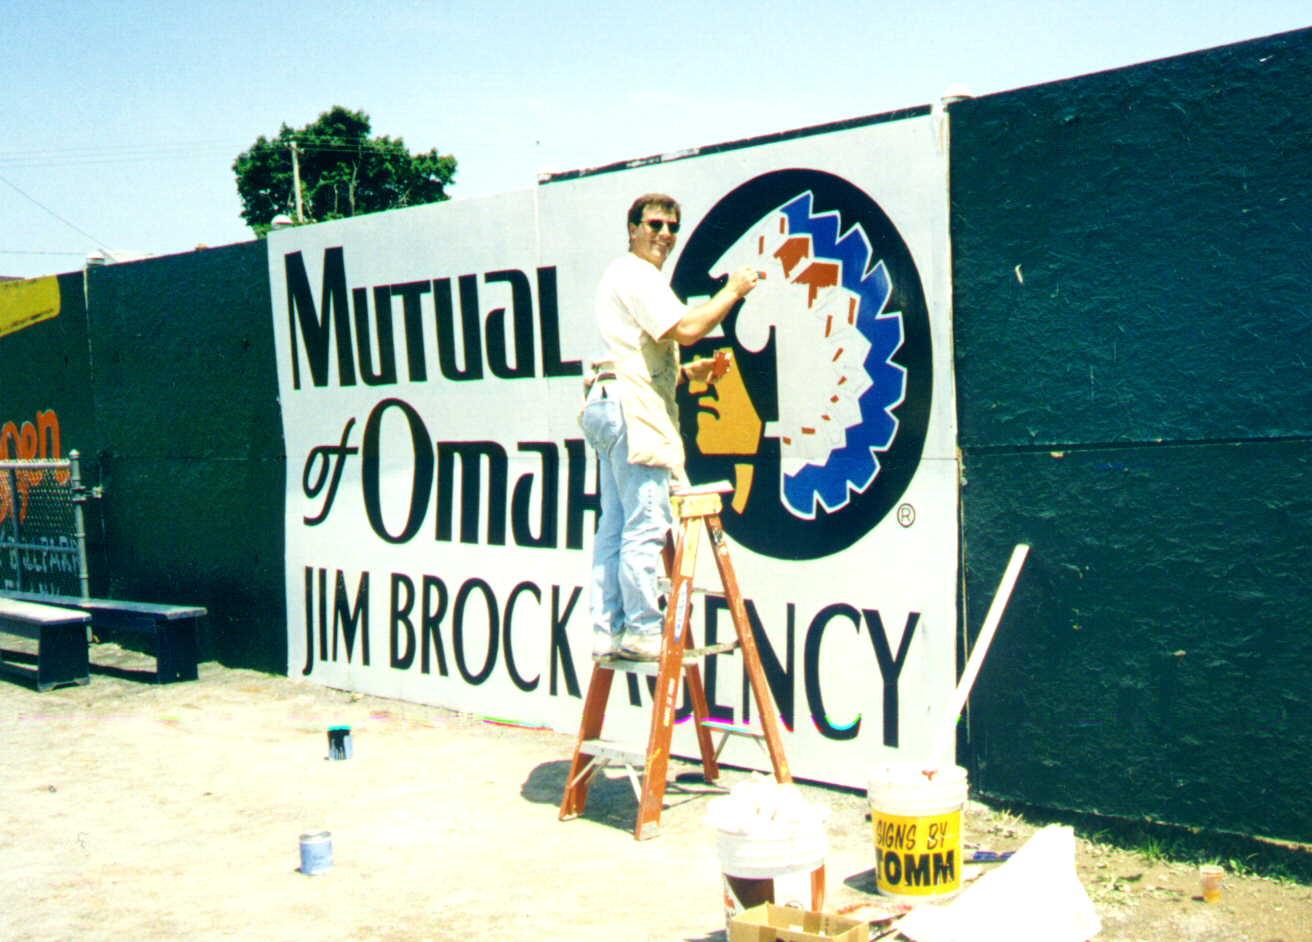 Brock wall.jpg